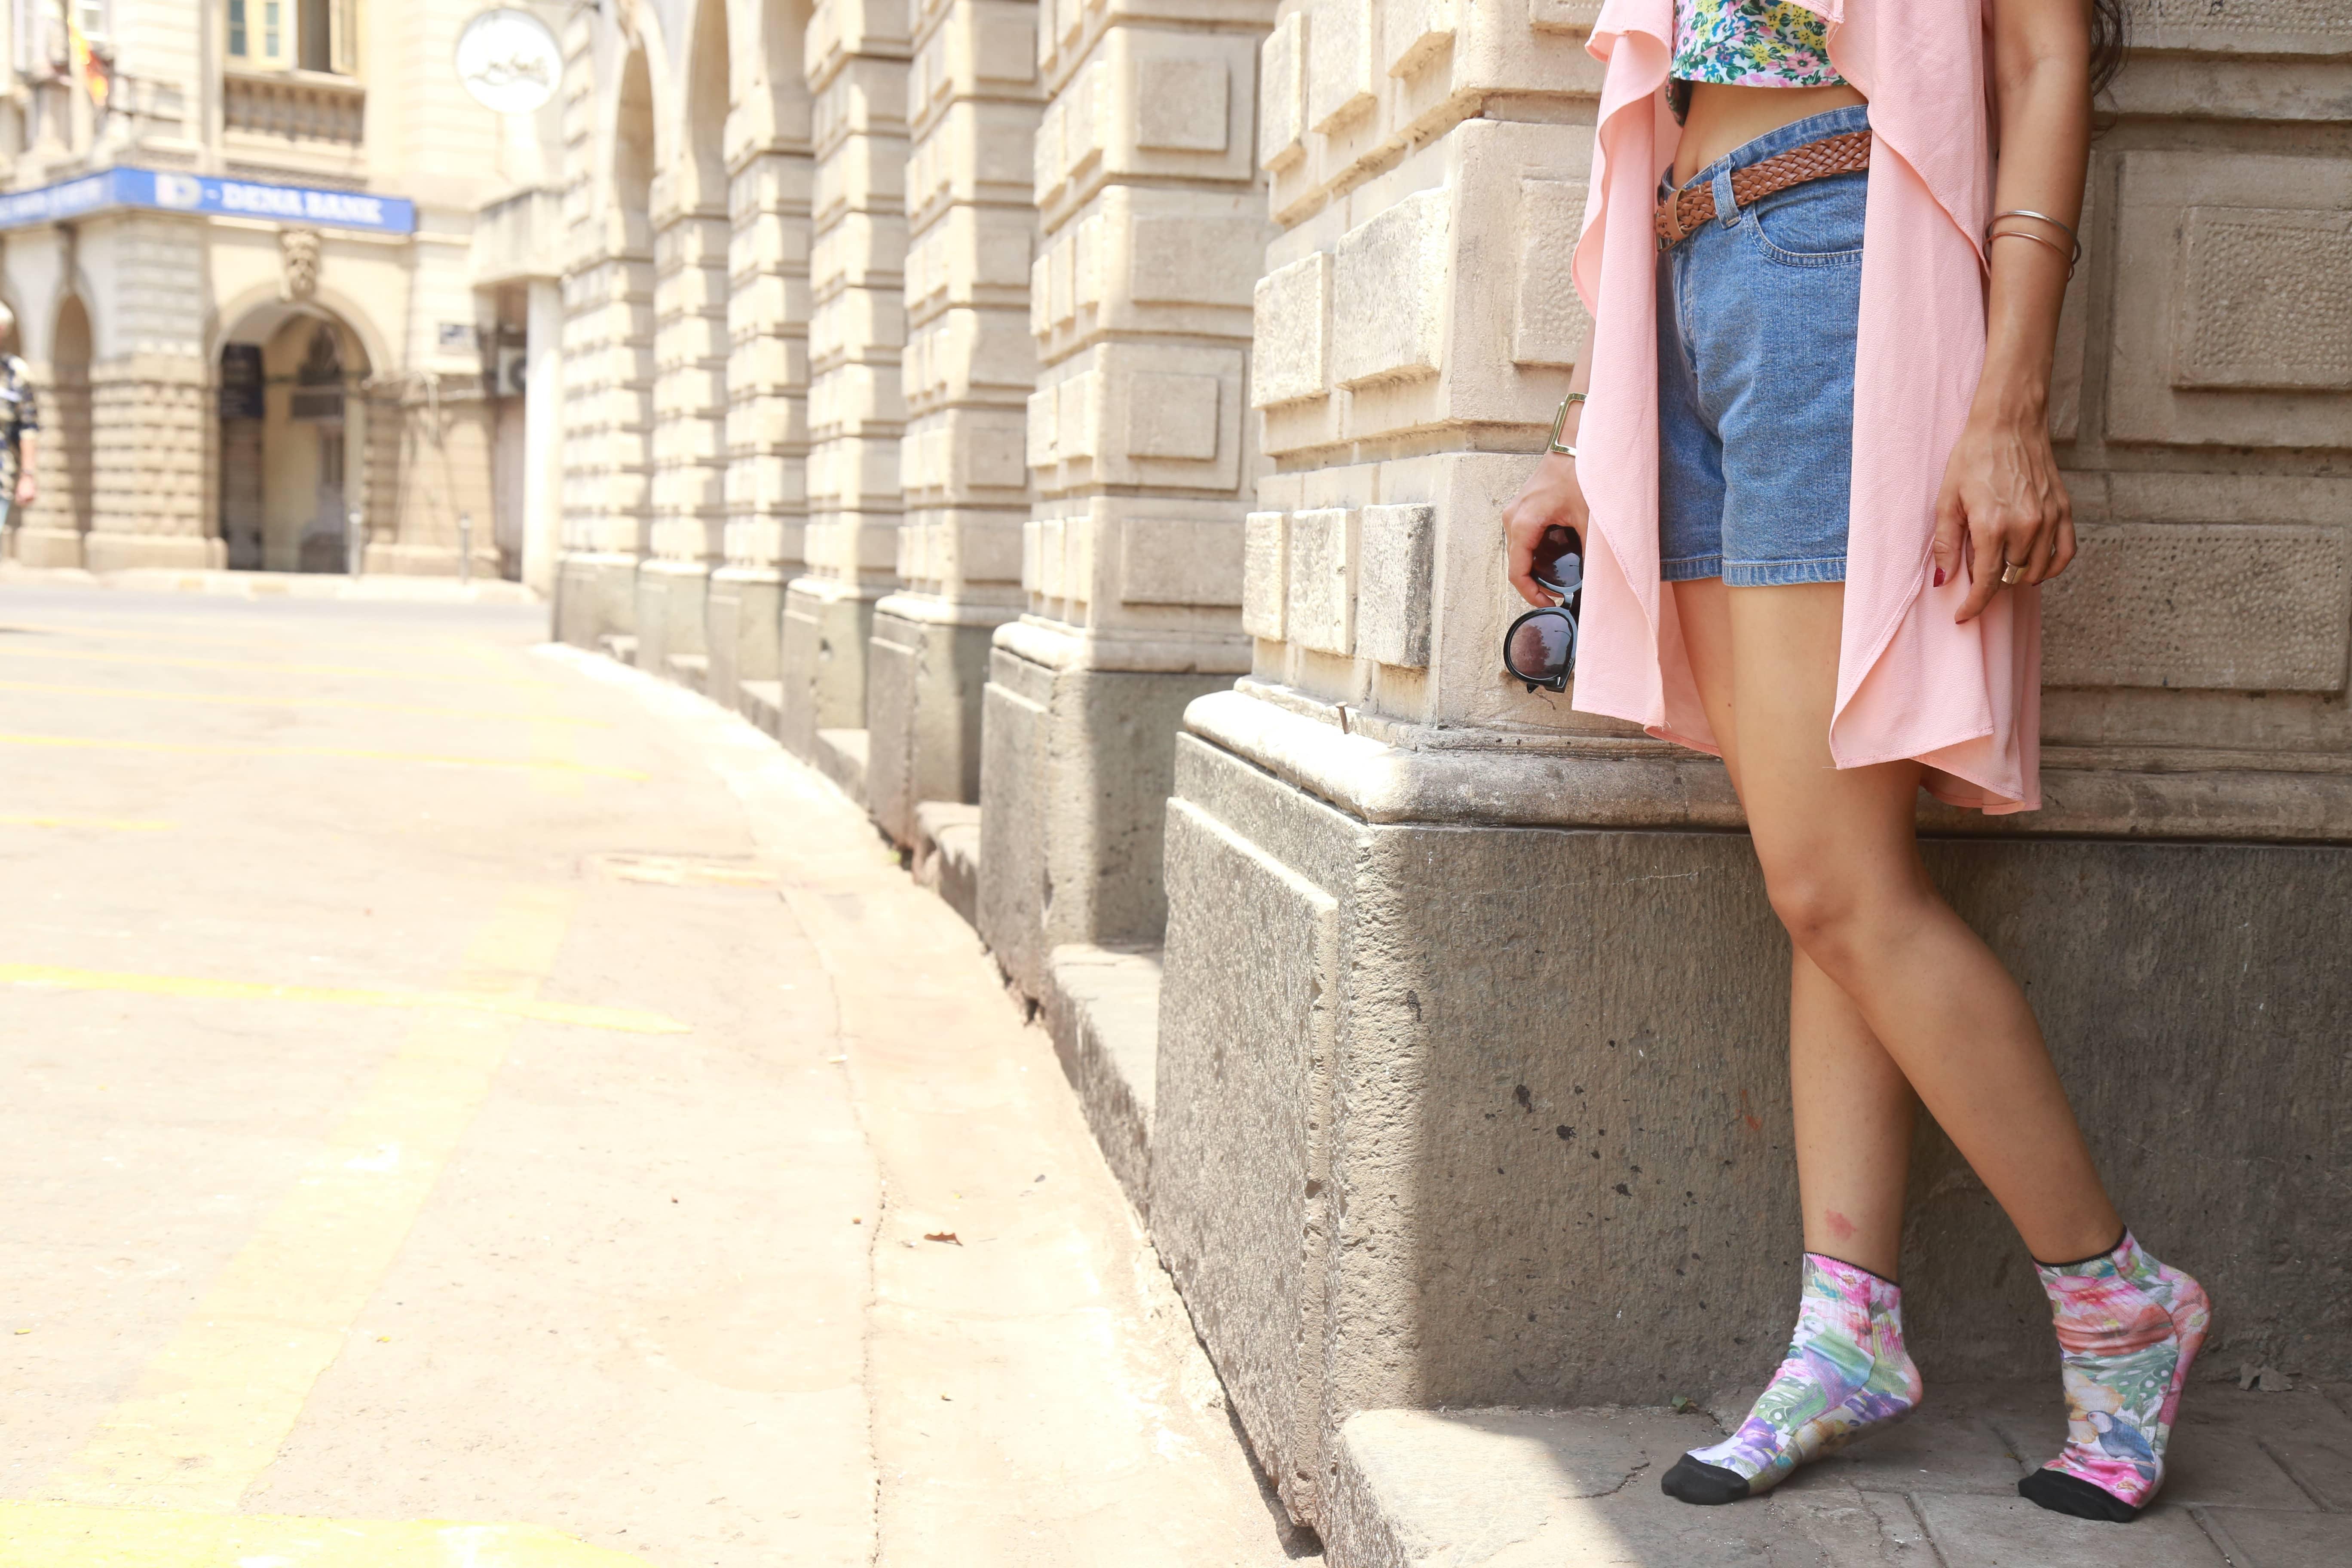 Dynamocks exotica socks for men & Women